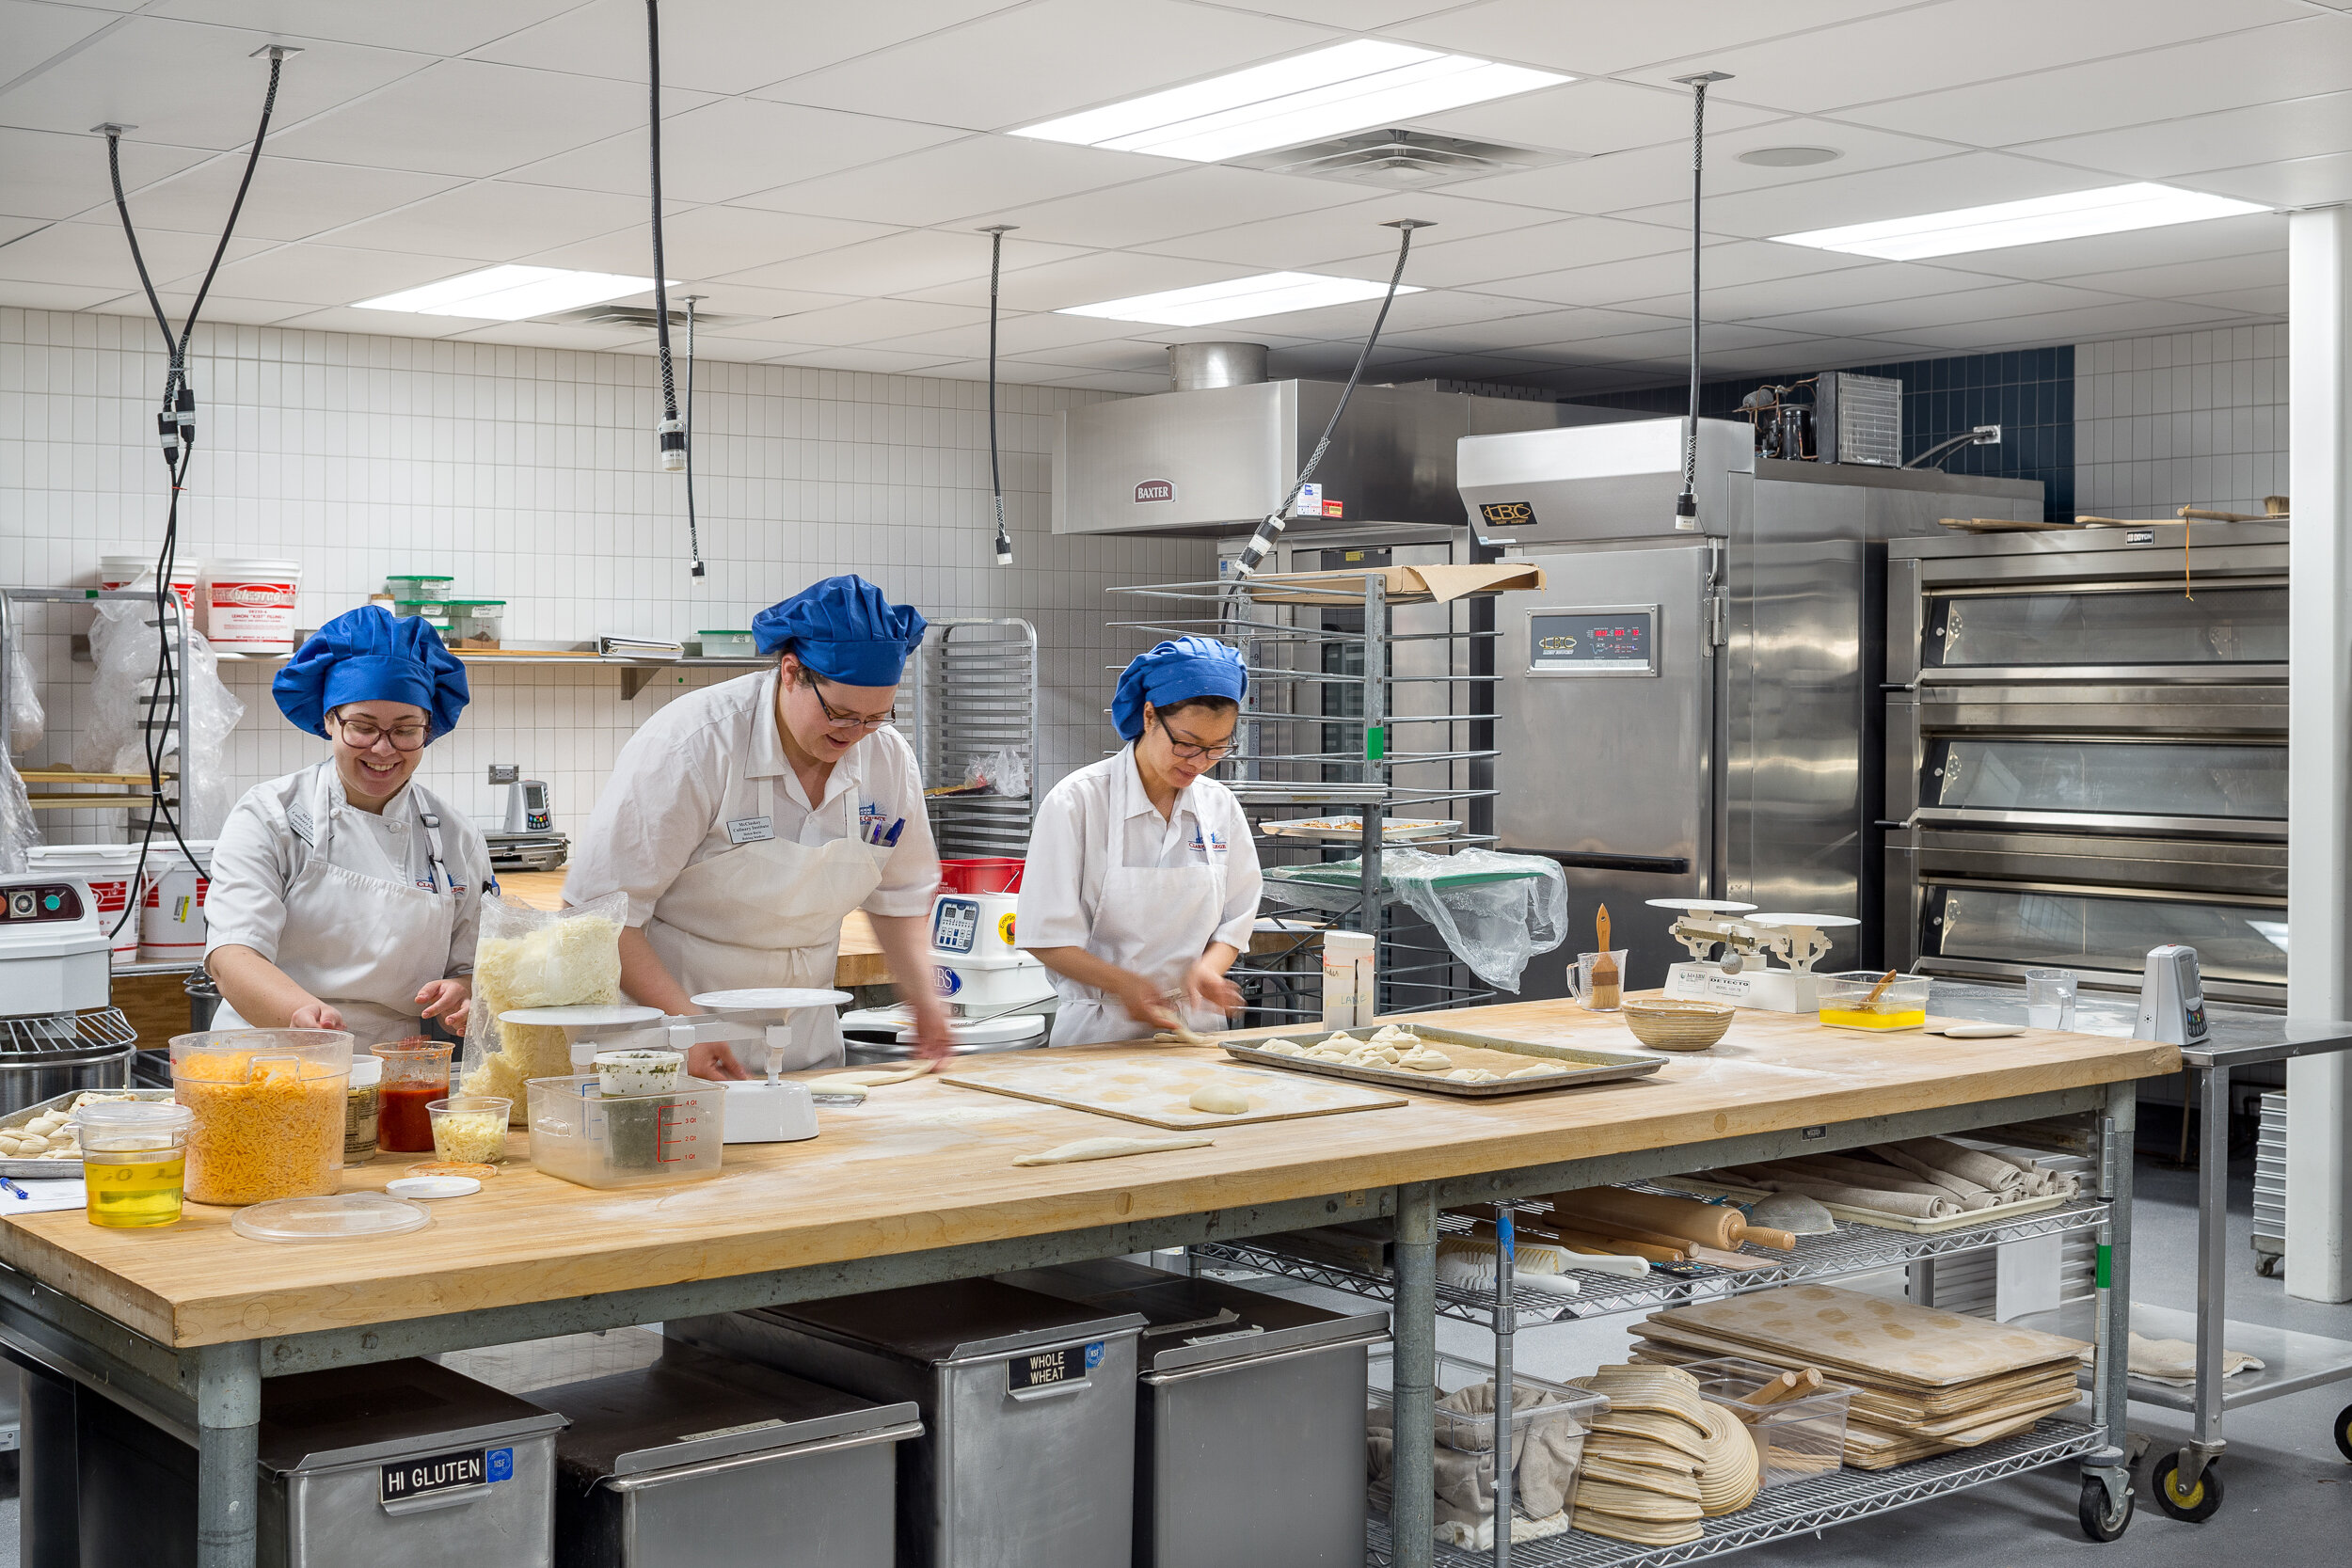 169-ClarkColl-Culinary-JoshPartee-3852.jpg